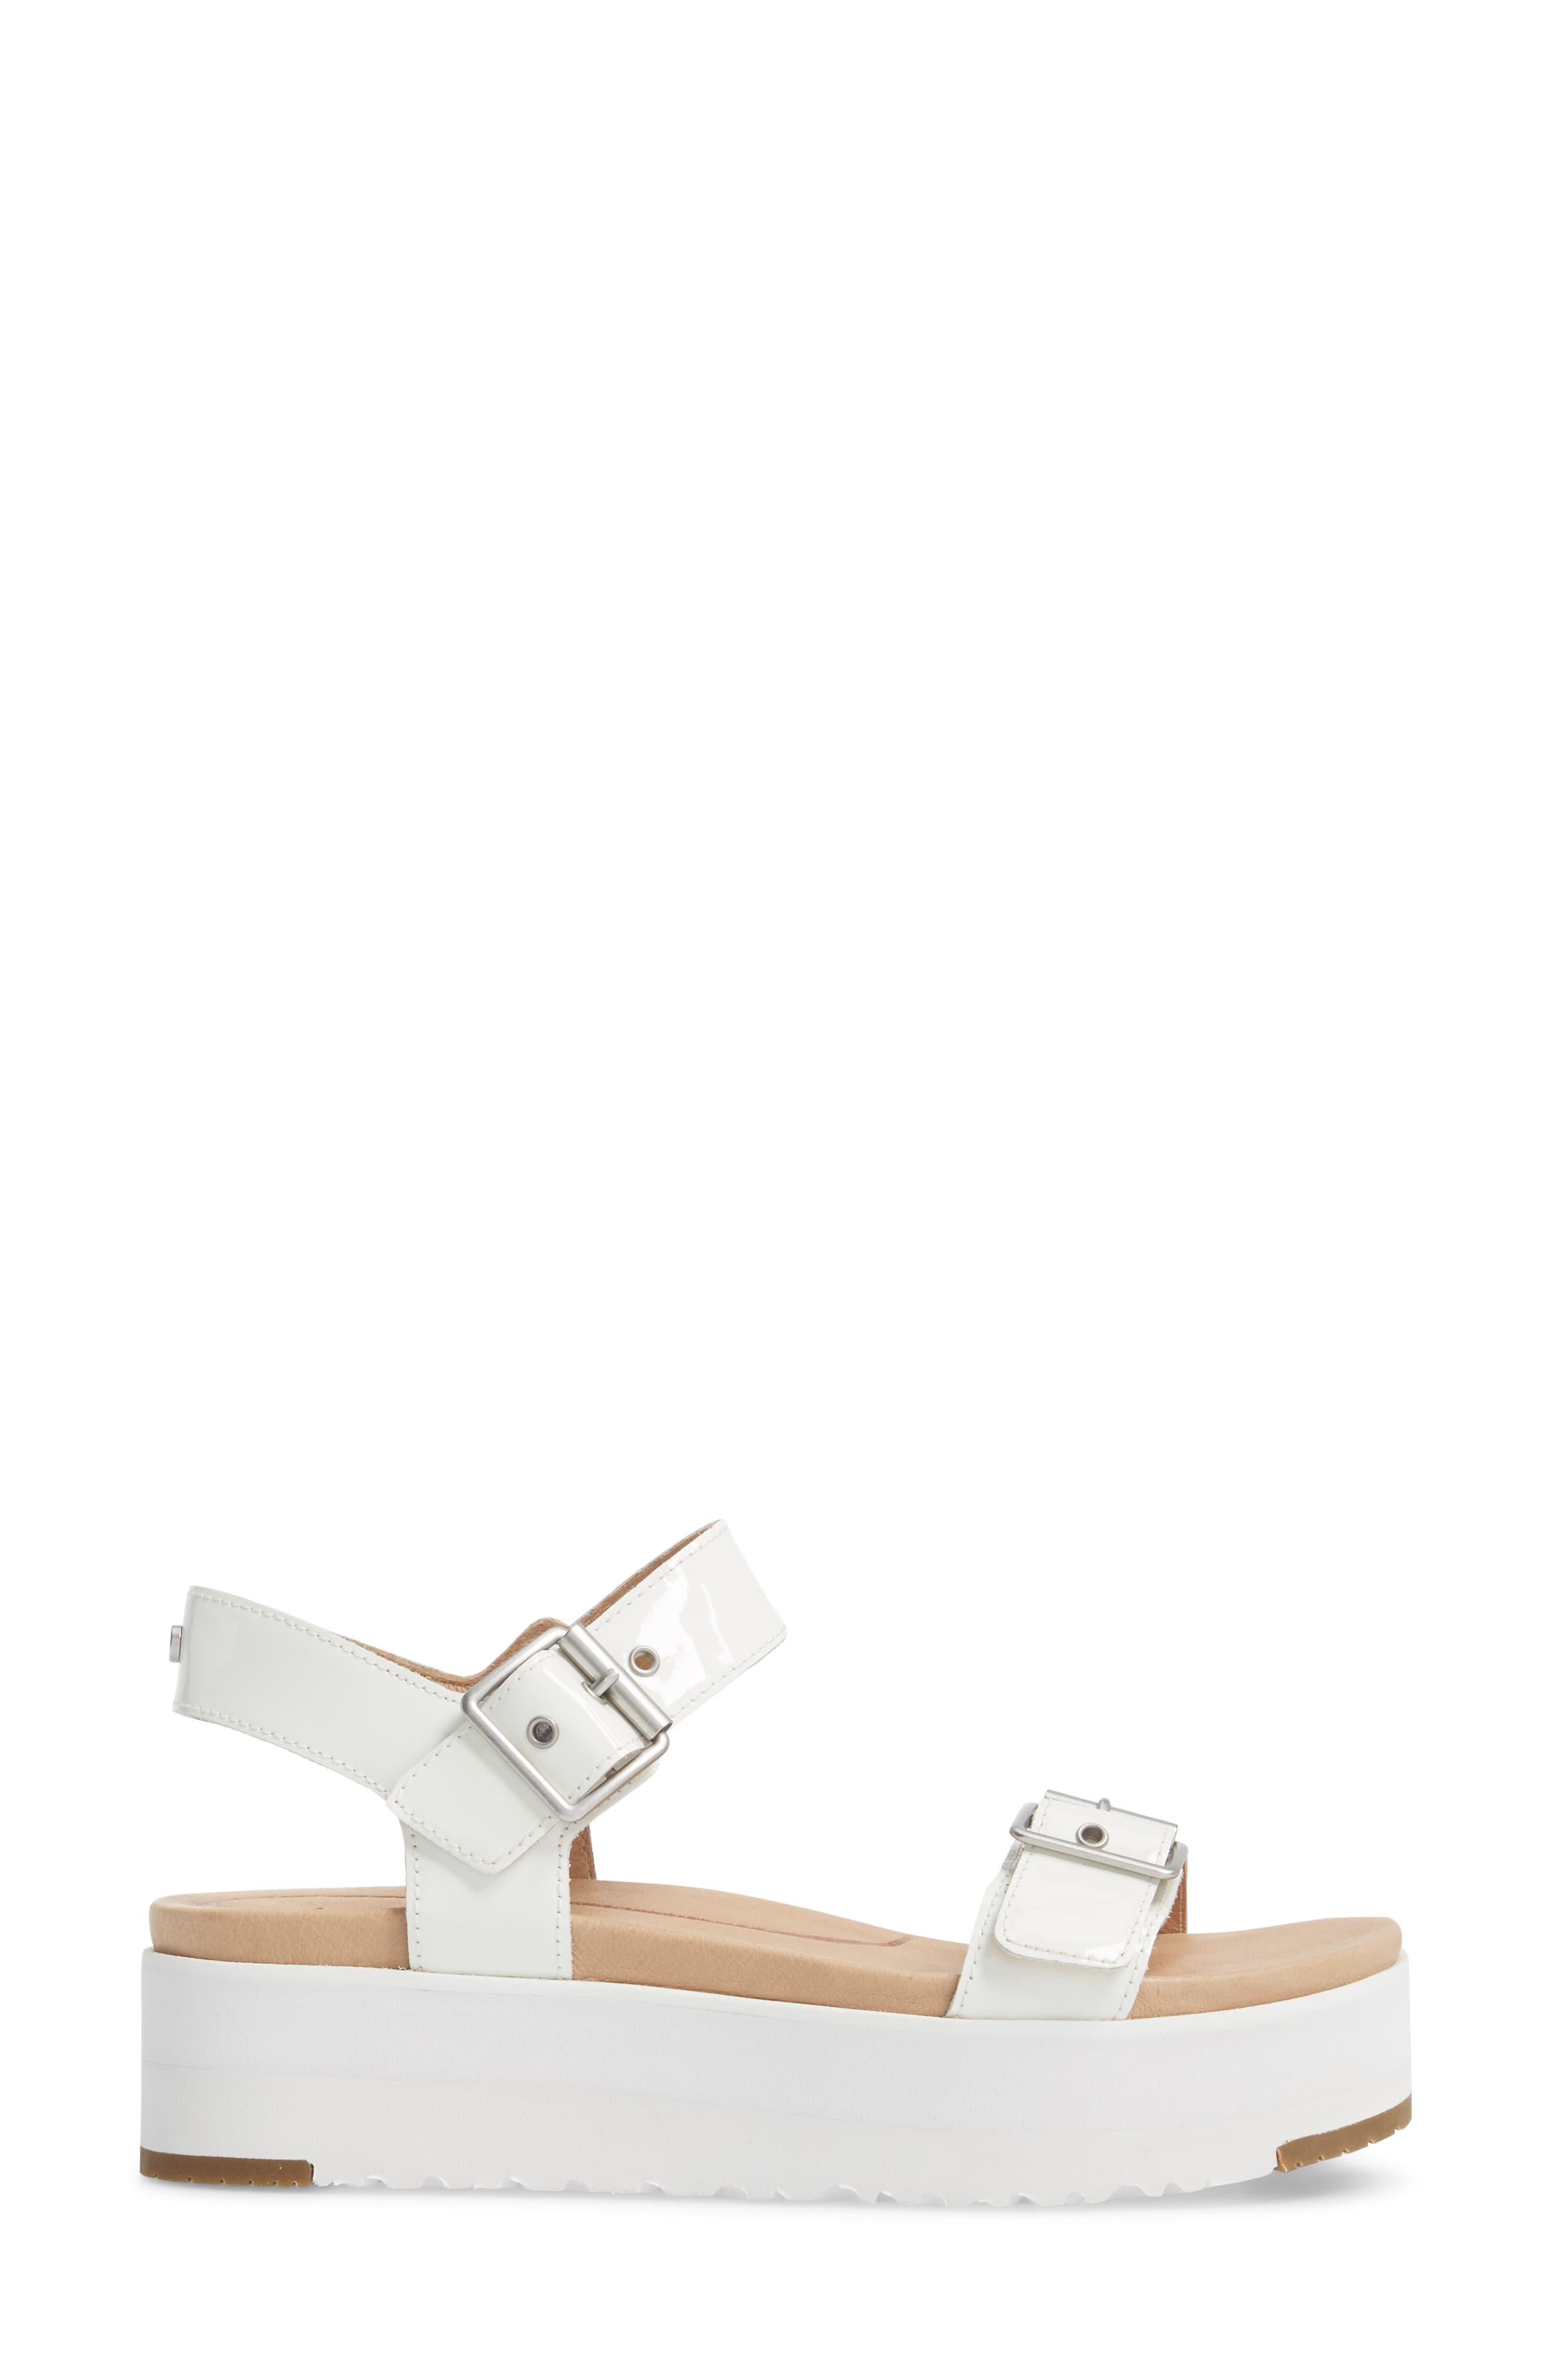 Angie Platform Sandal,                             Alternate thumbnail 3, color,                             White Leather